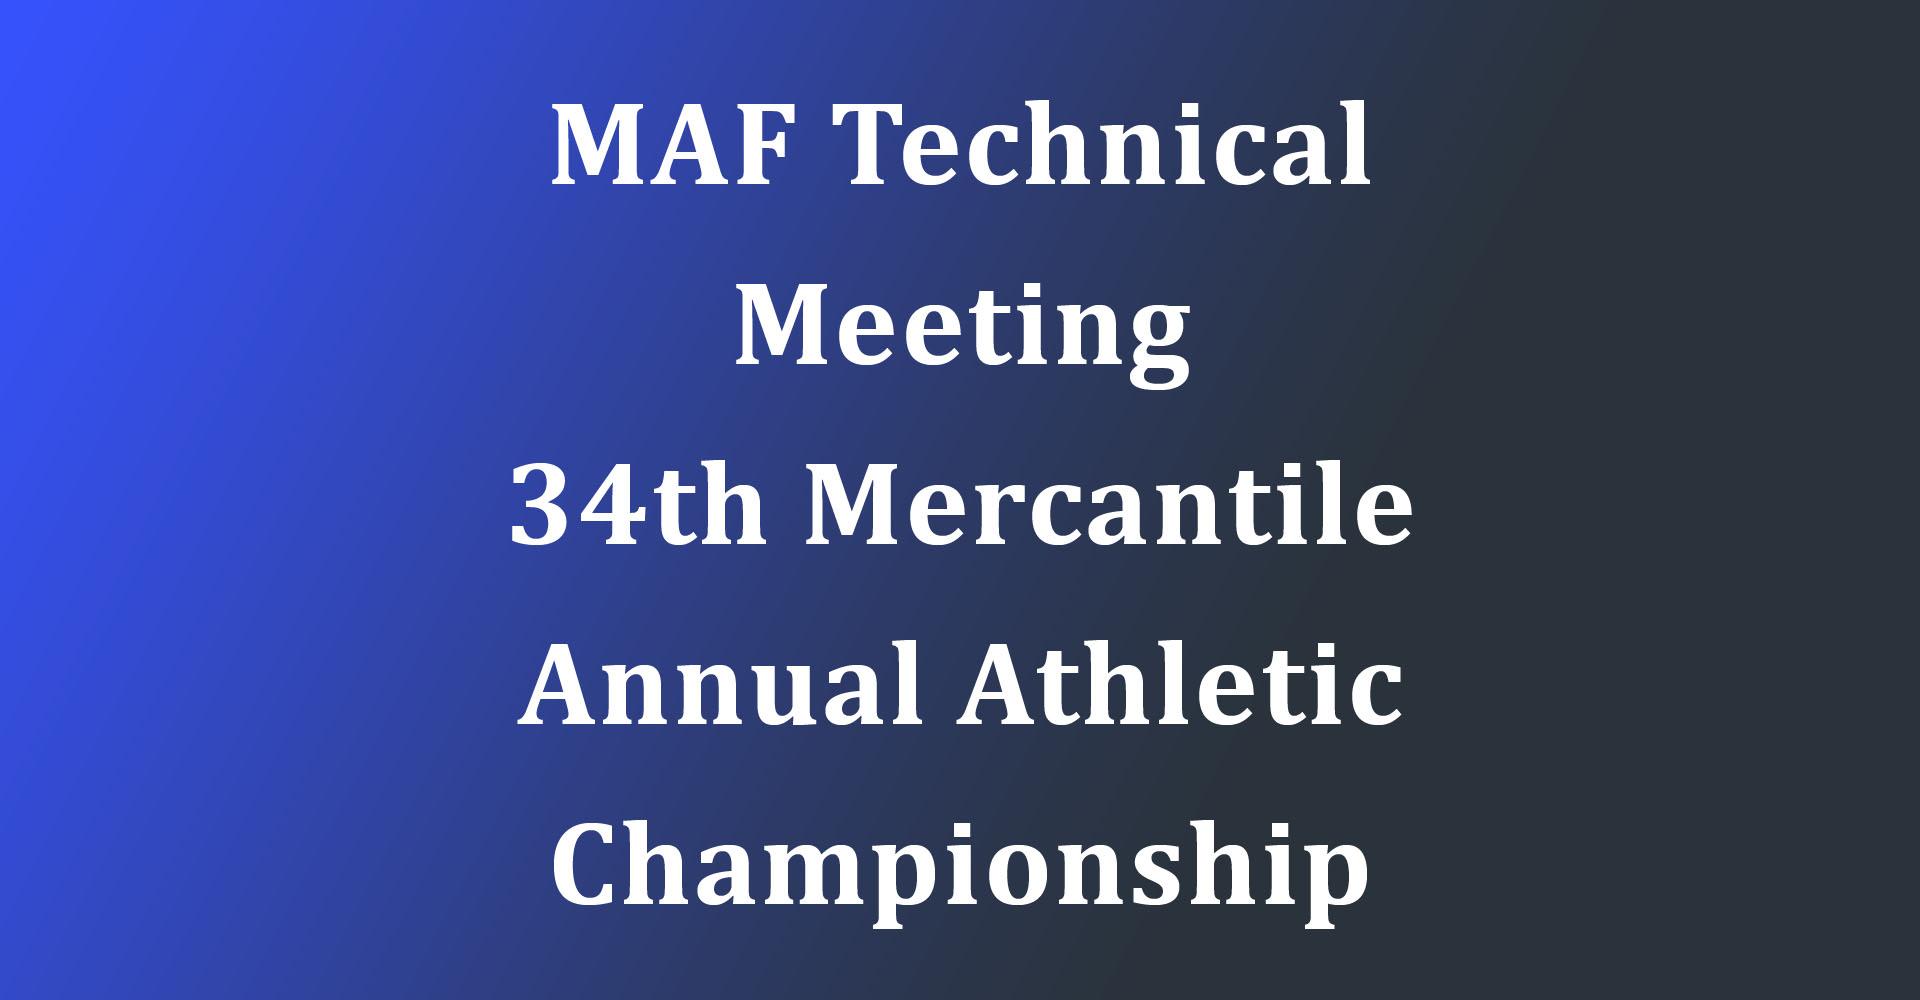 maf-tech-meeting-2017